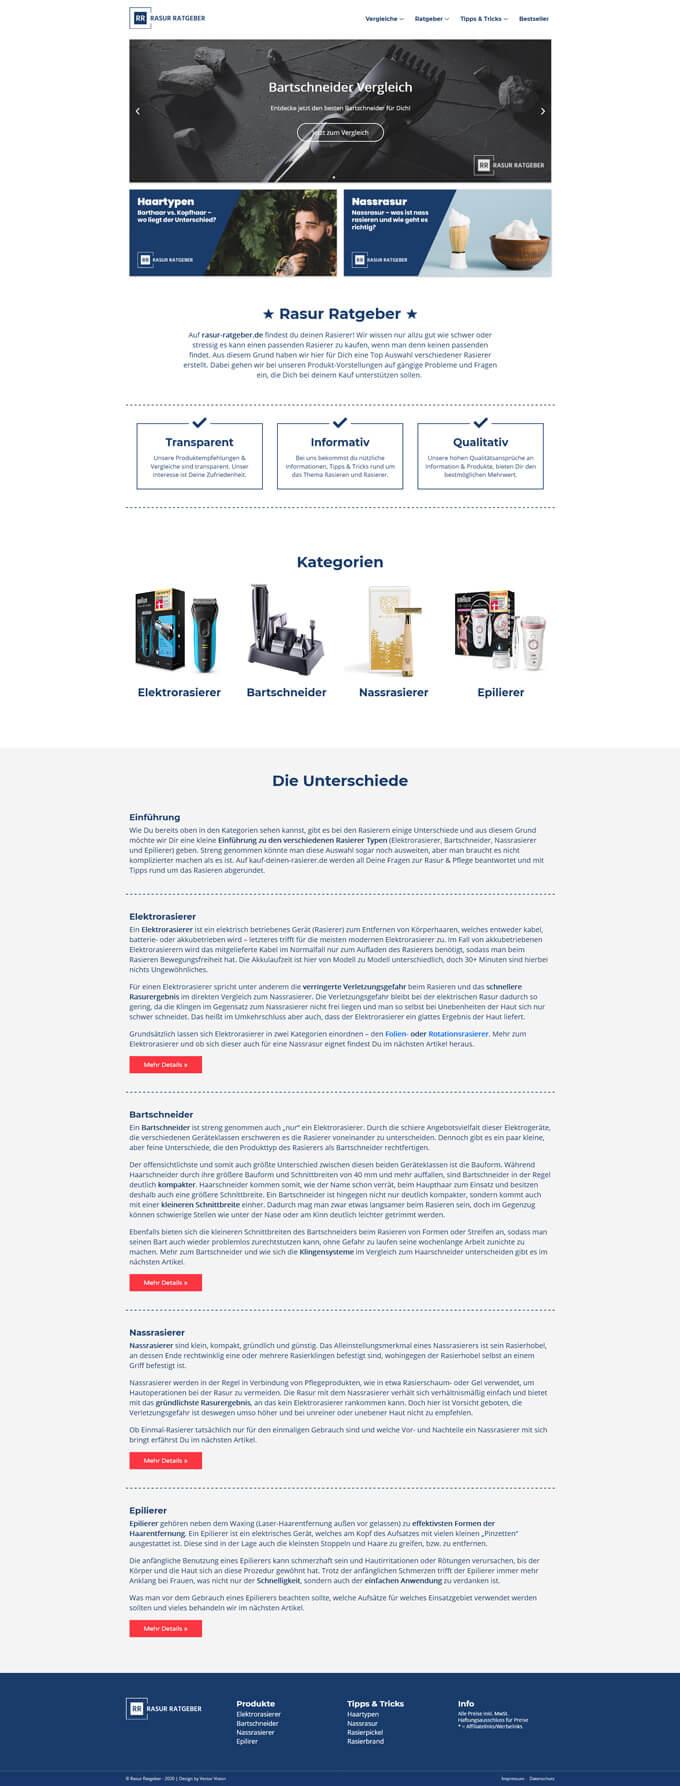 Rasur Ratgeber - Website